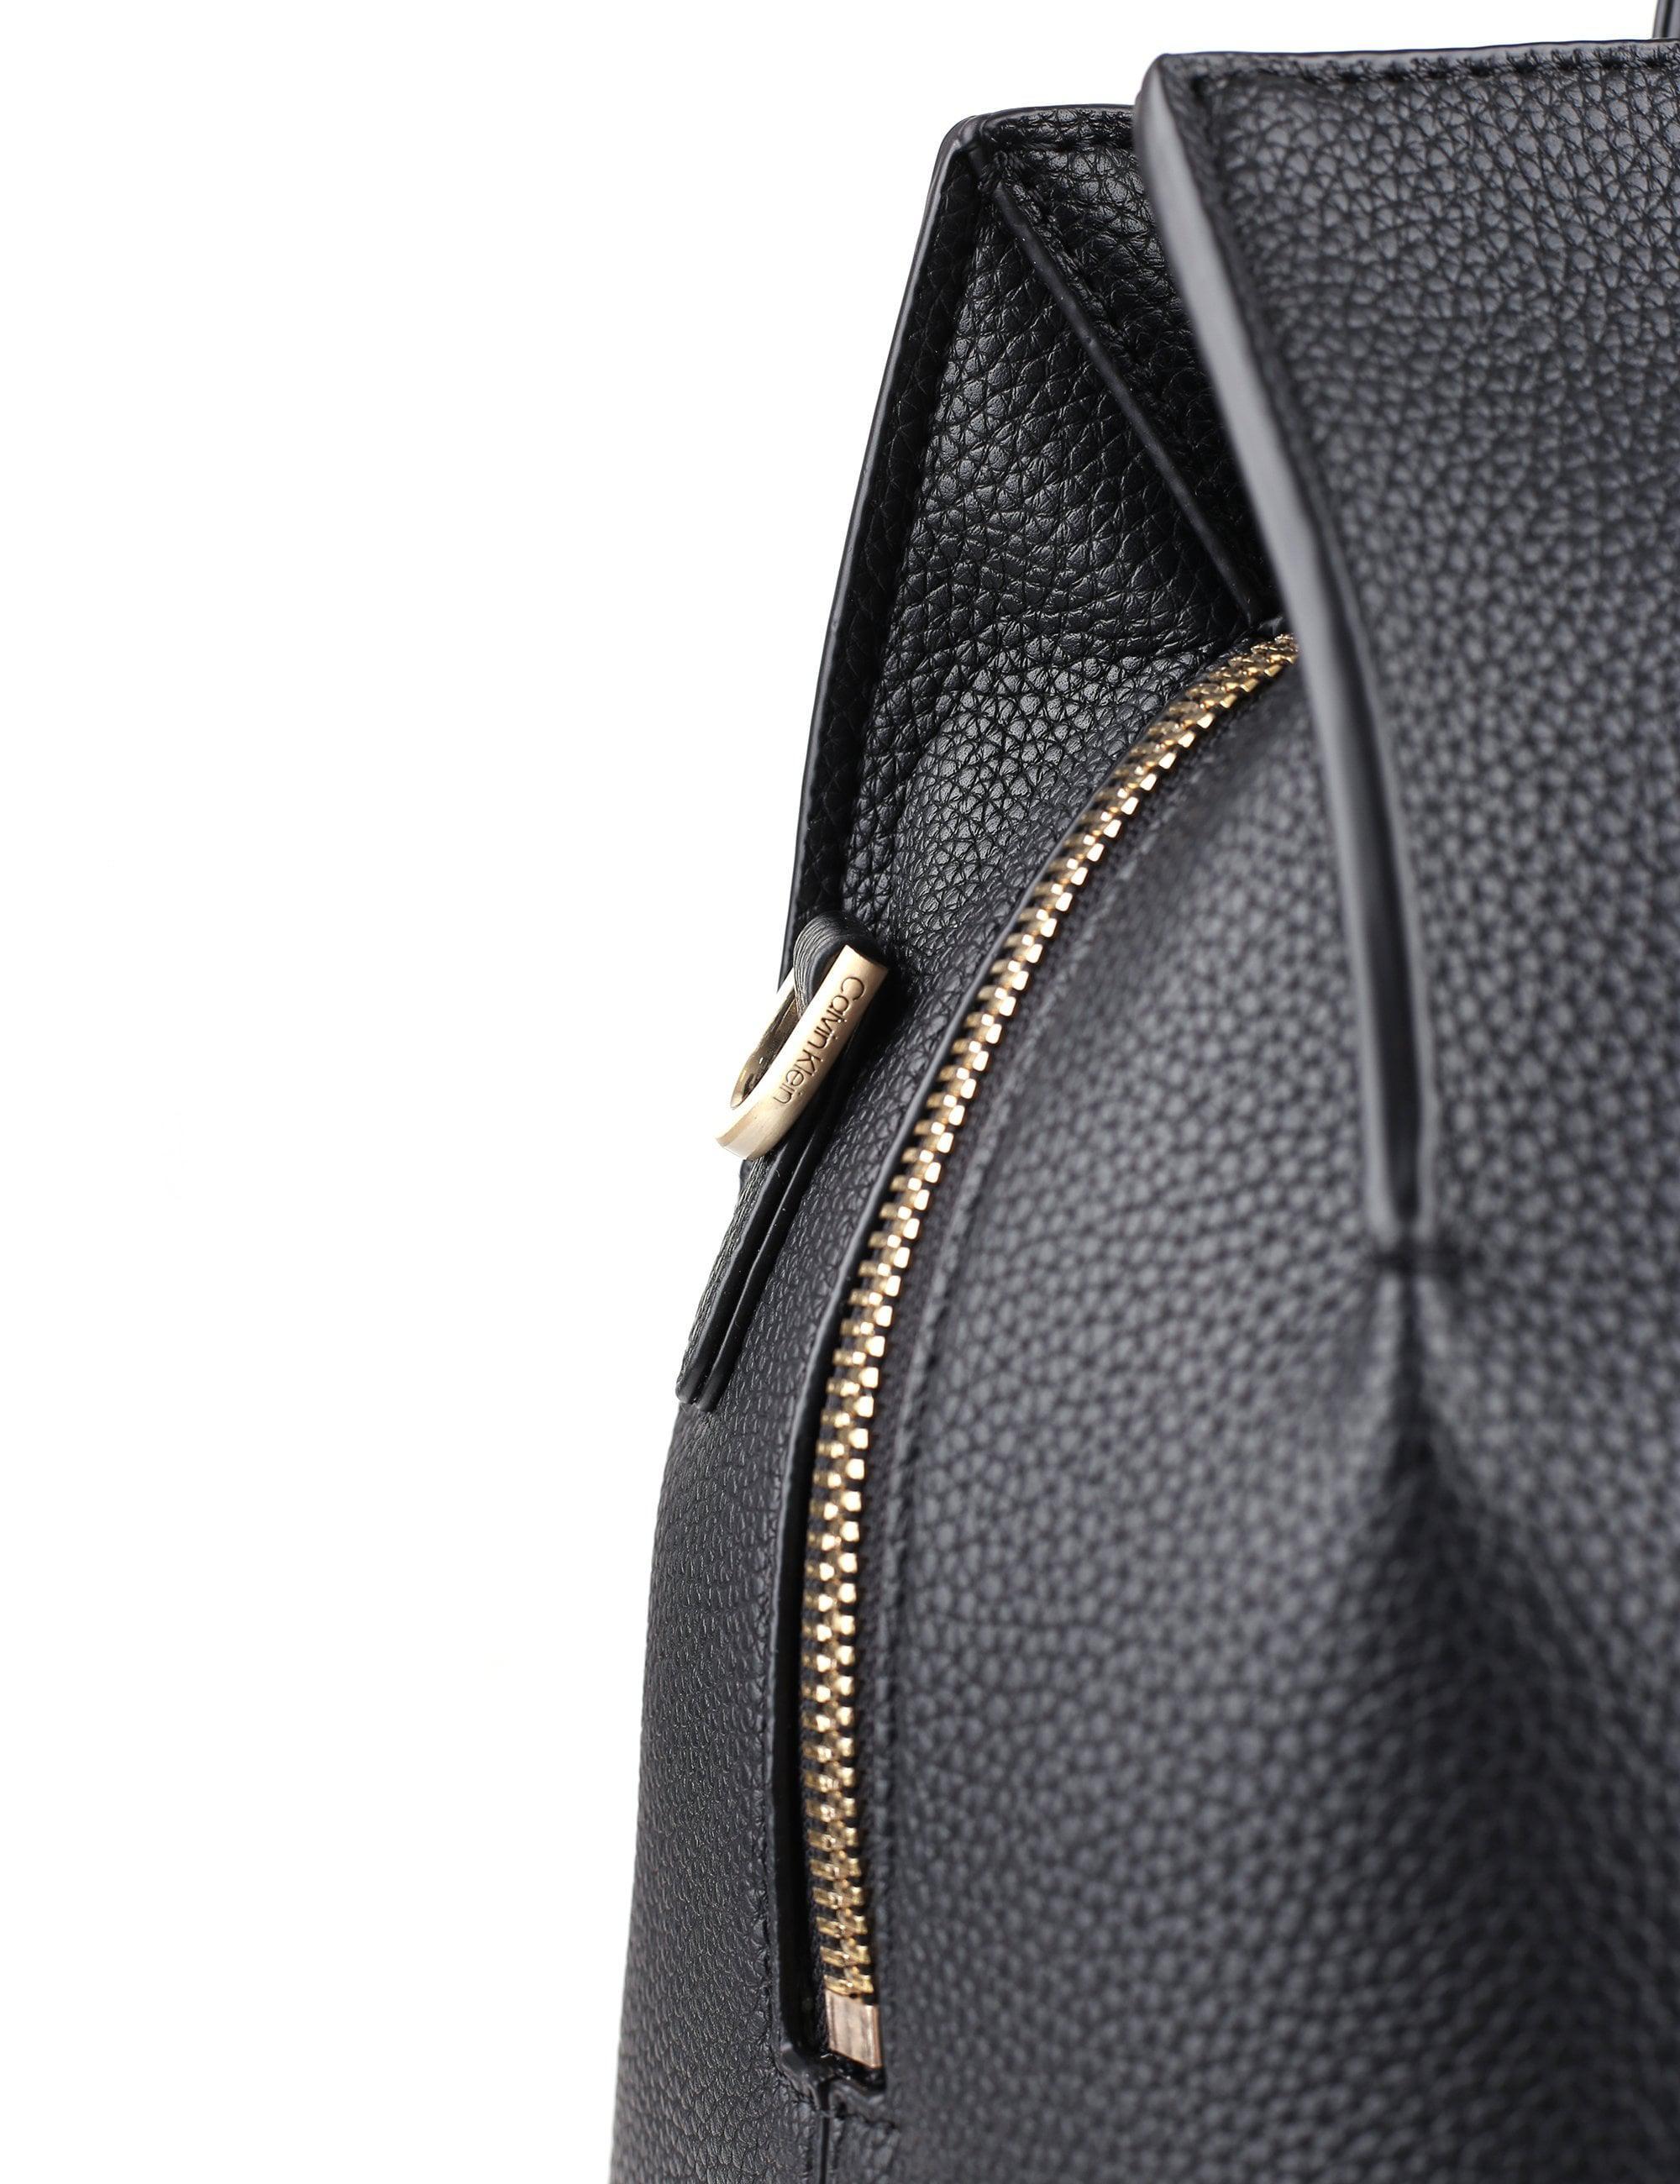 2b996b3329d Calvin Klein Neat Large Tote Bag in Black - Lyst